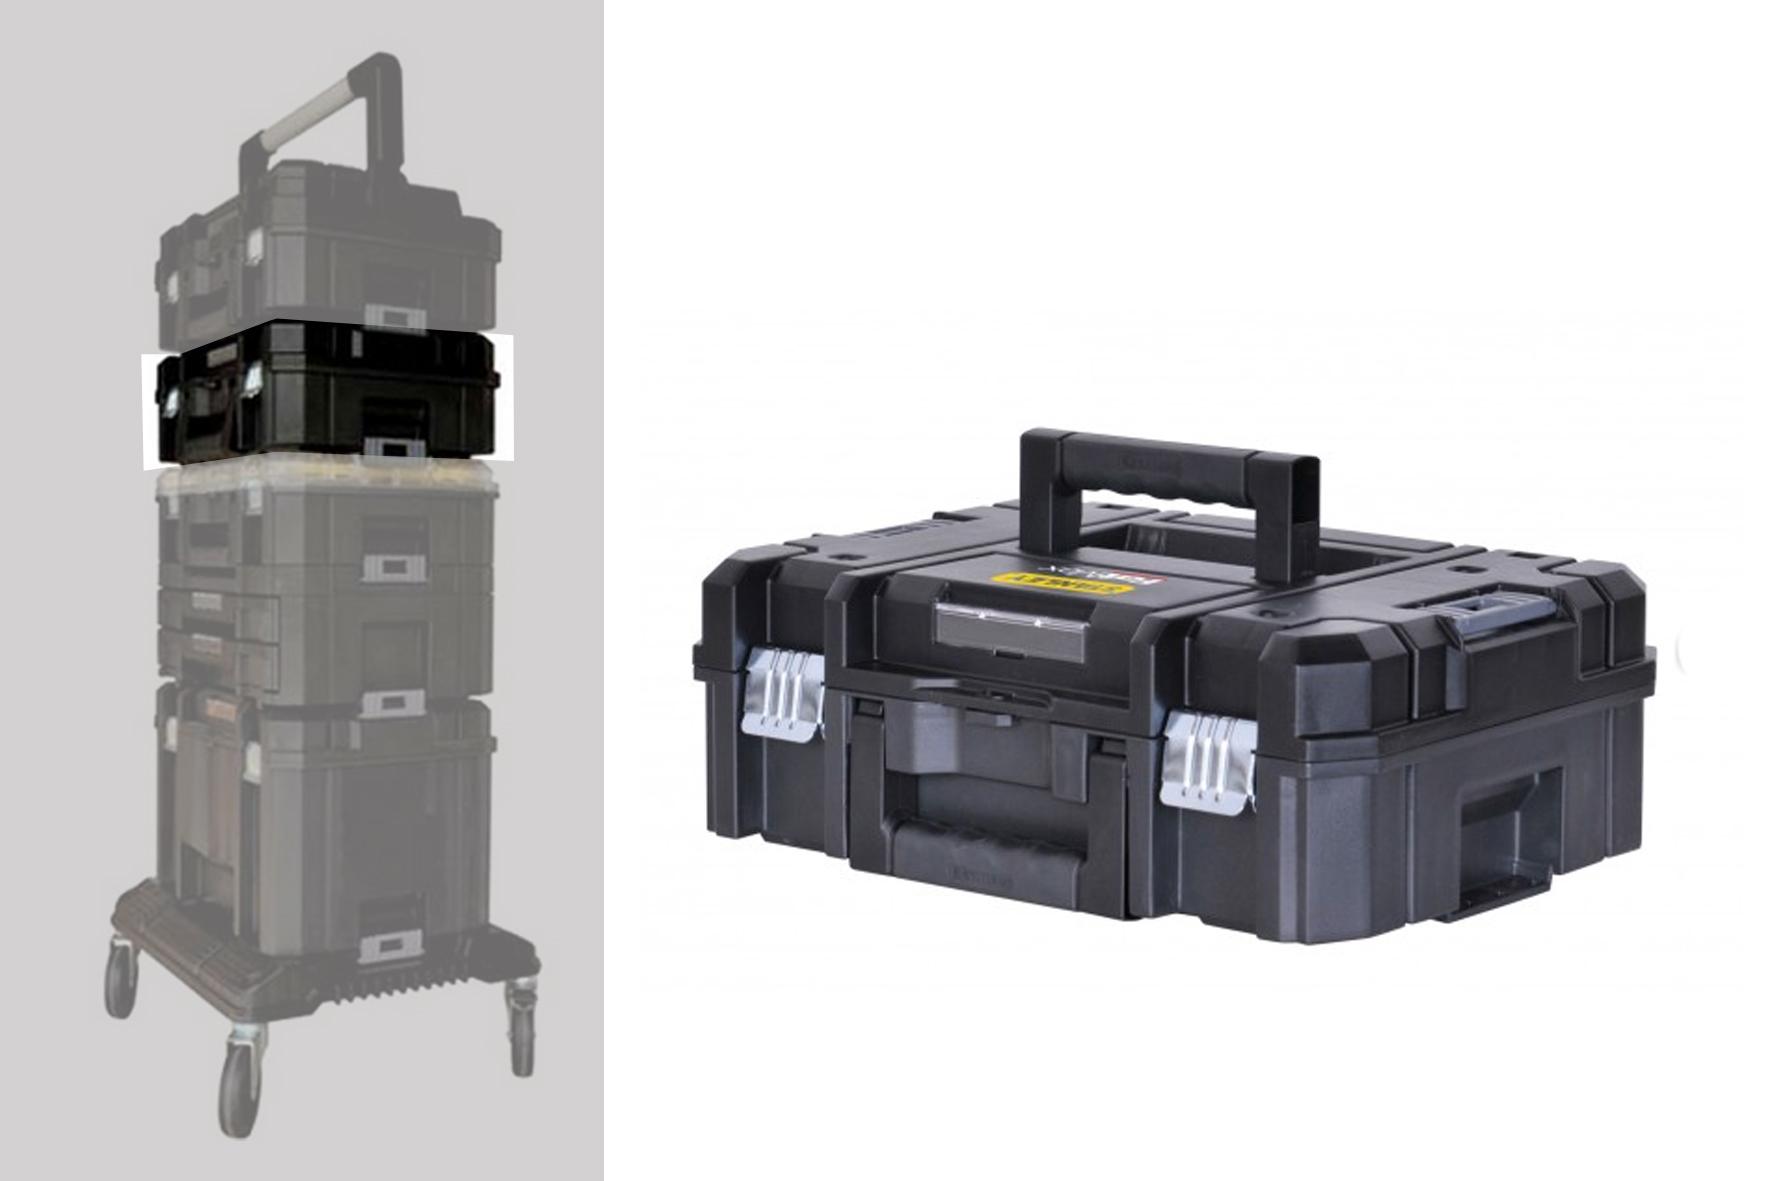 bo te 39 39 outils tstak ii achat en ligne ou dans notre. Black Bedroom Furniture Sets. Home Design Ideas